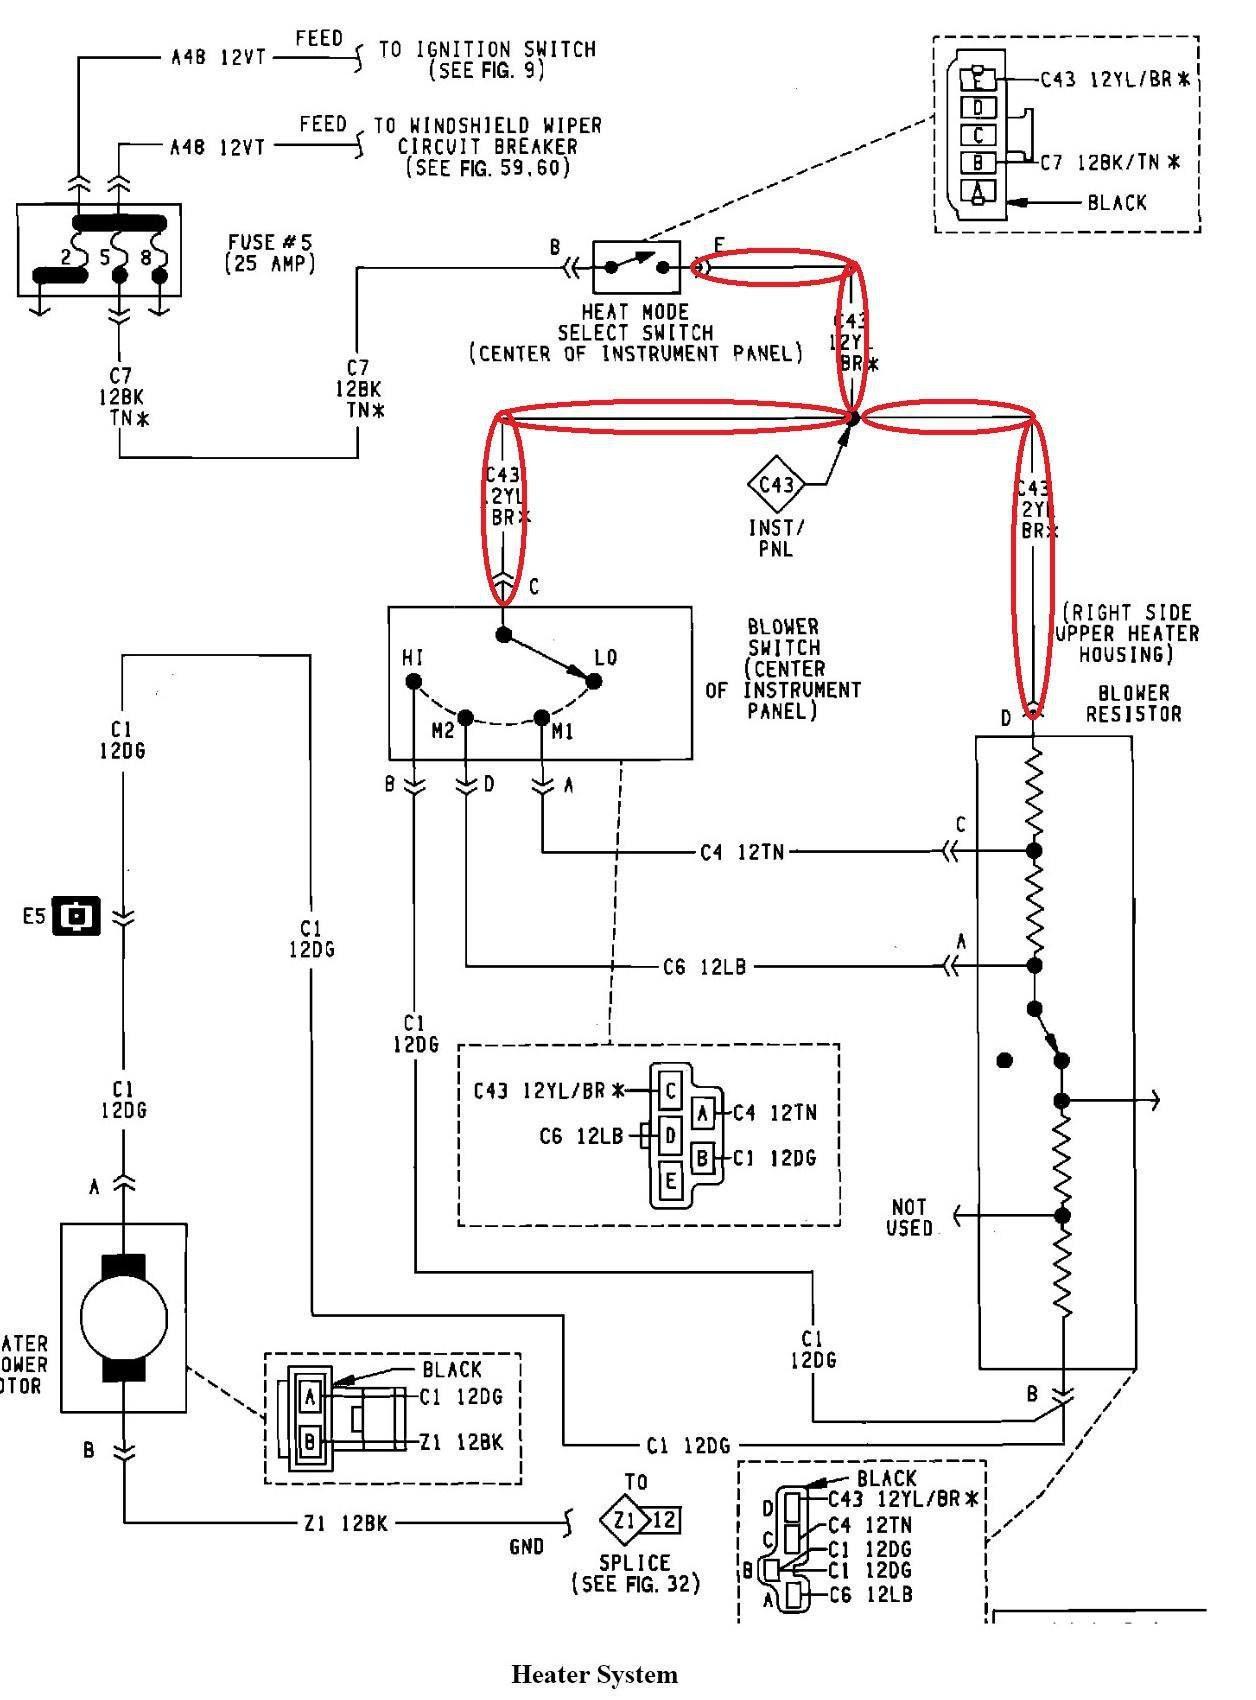 48 Volt Club Car Ds Wiring Diagram Electric Blower Motor Wiring Diagram Begeboy Wiring Diagram Source